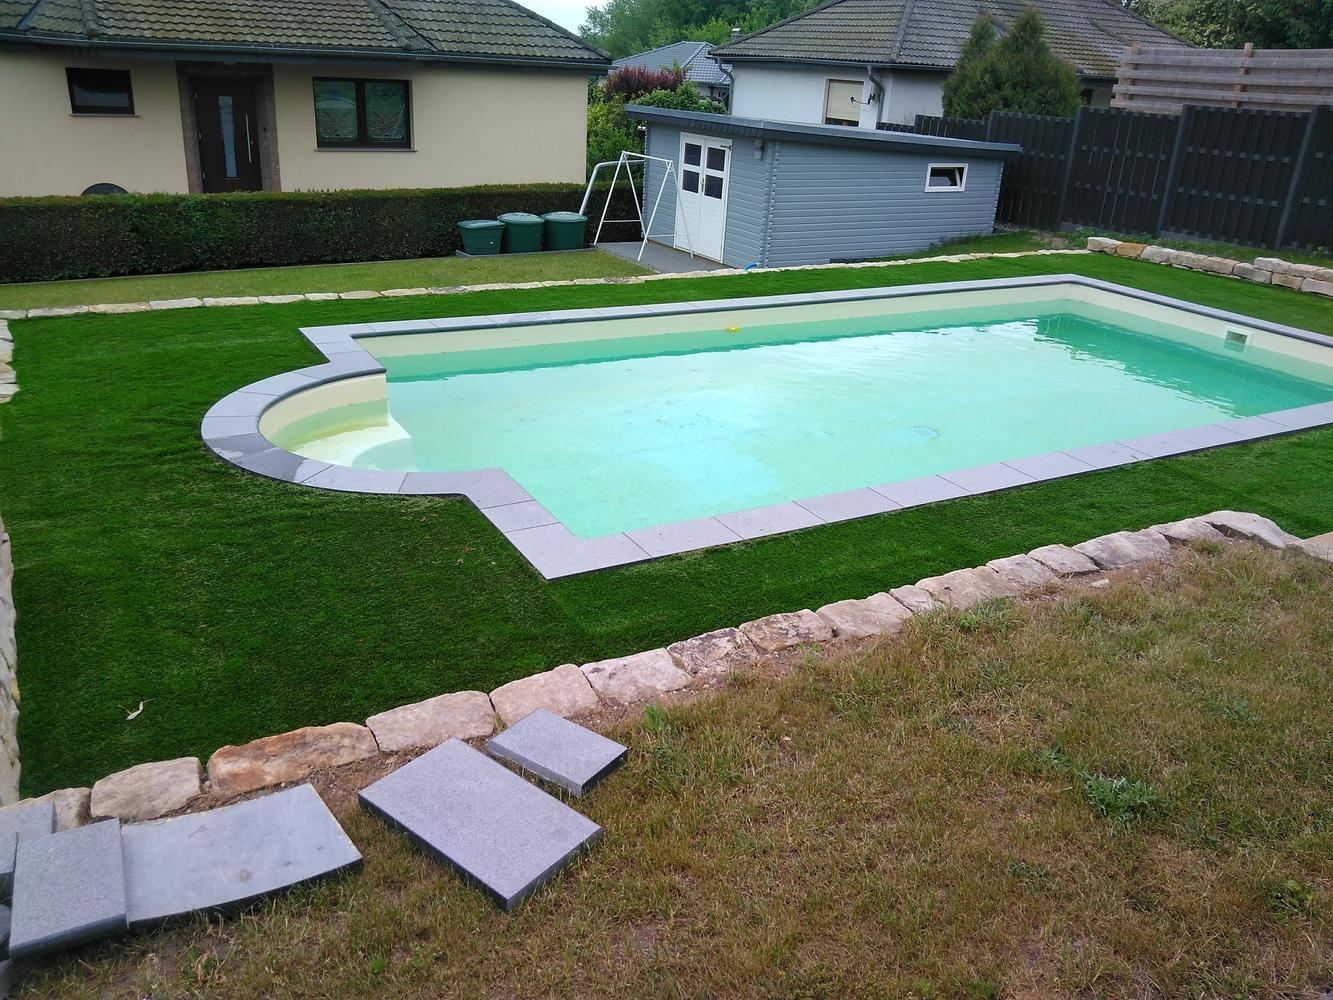 Kunstrasen als Pool-Umrandung für Swimming-Pools